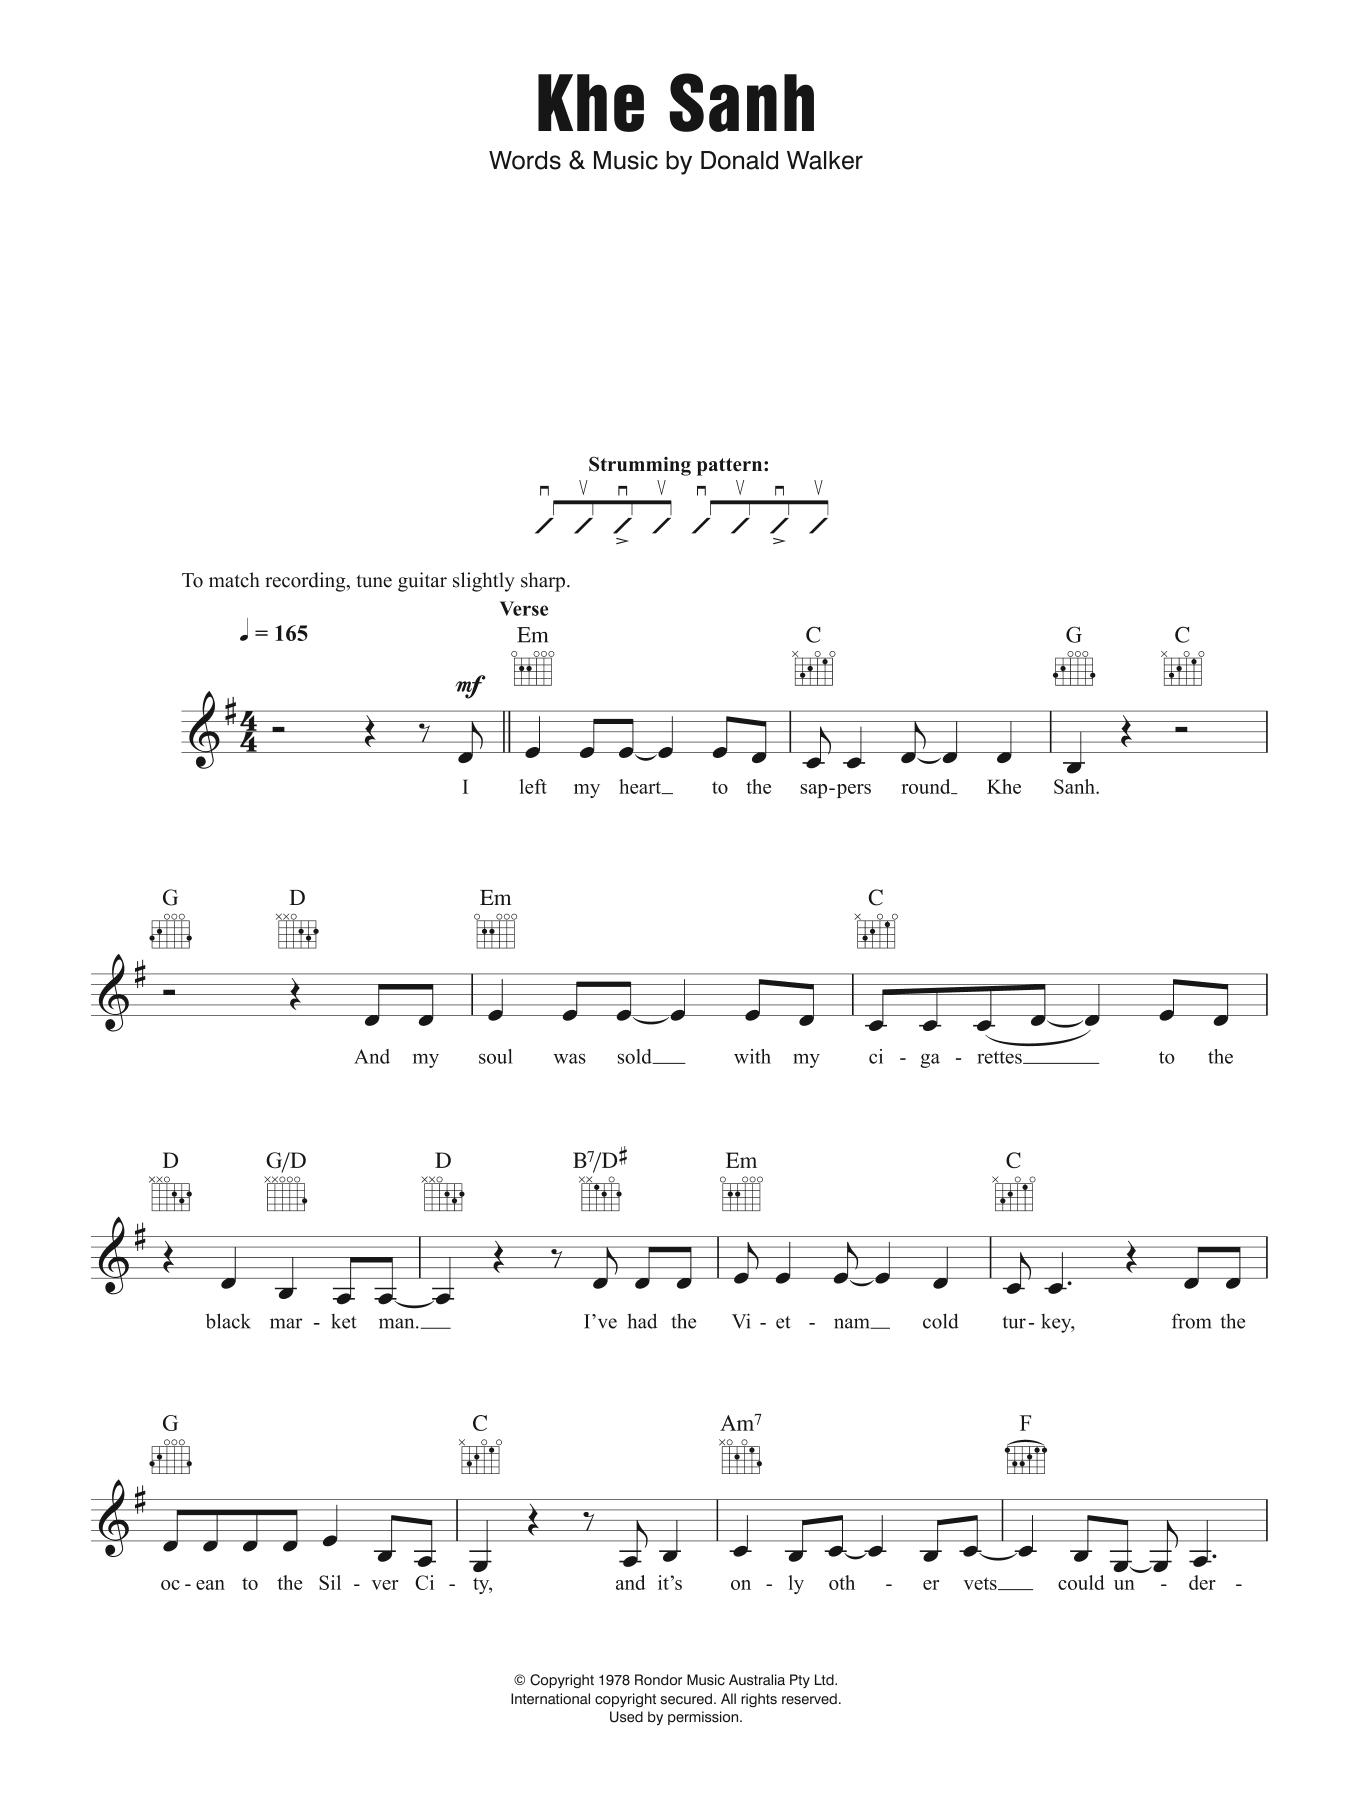 Khe Sanh Sheet Music